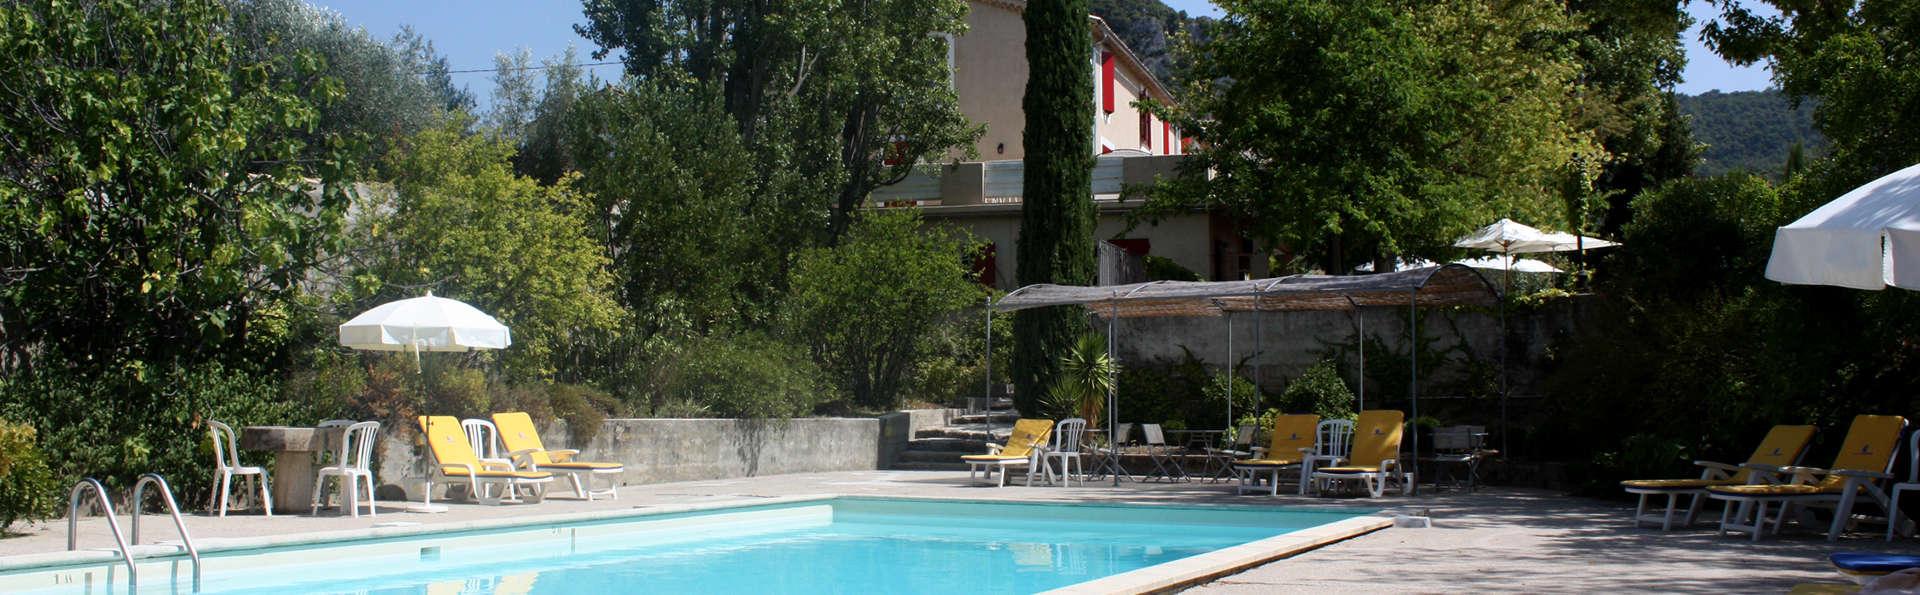 Hostellerie du Domaine de Cabasse - EDIT_pool.jpg